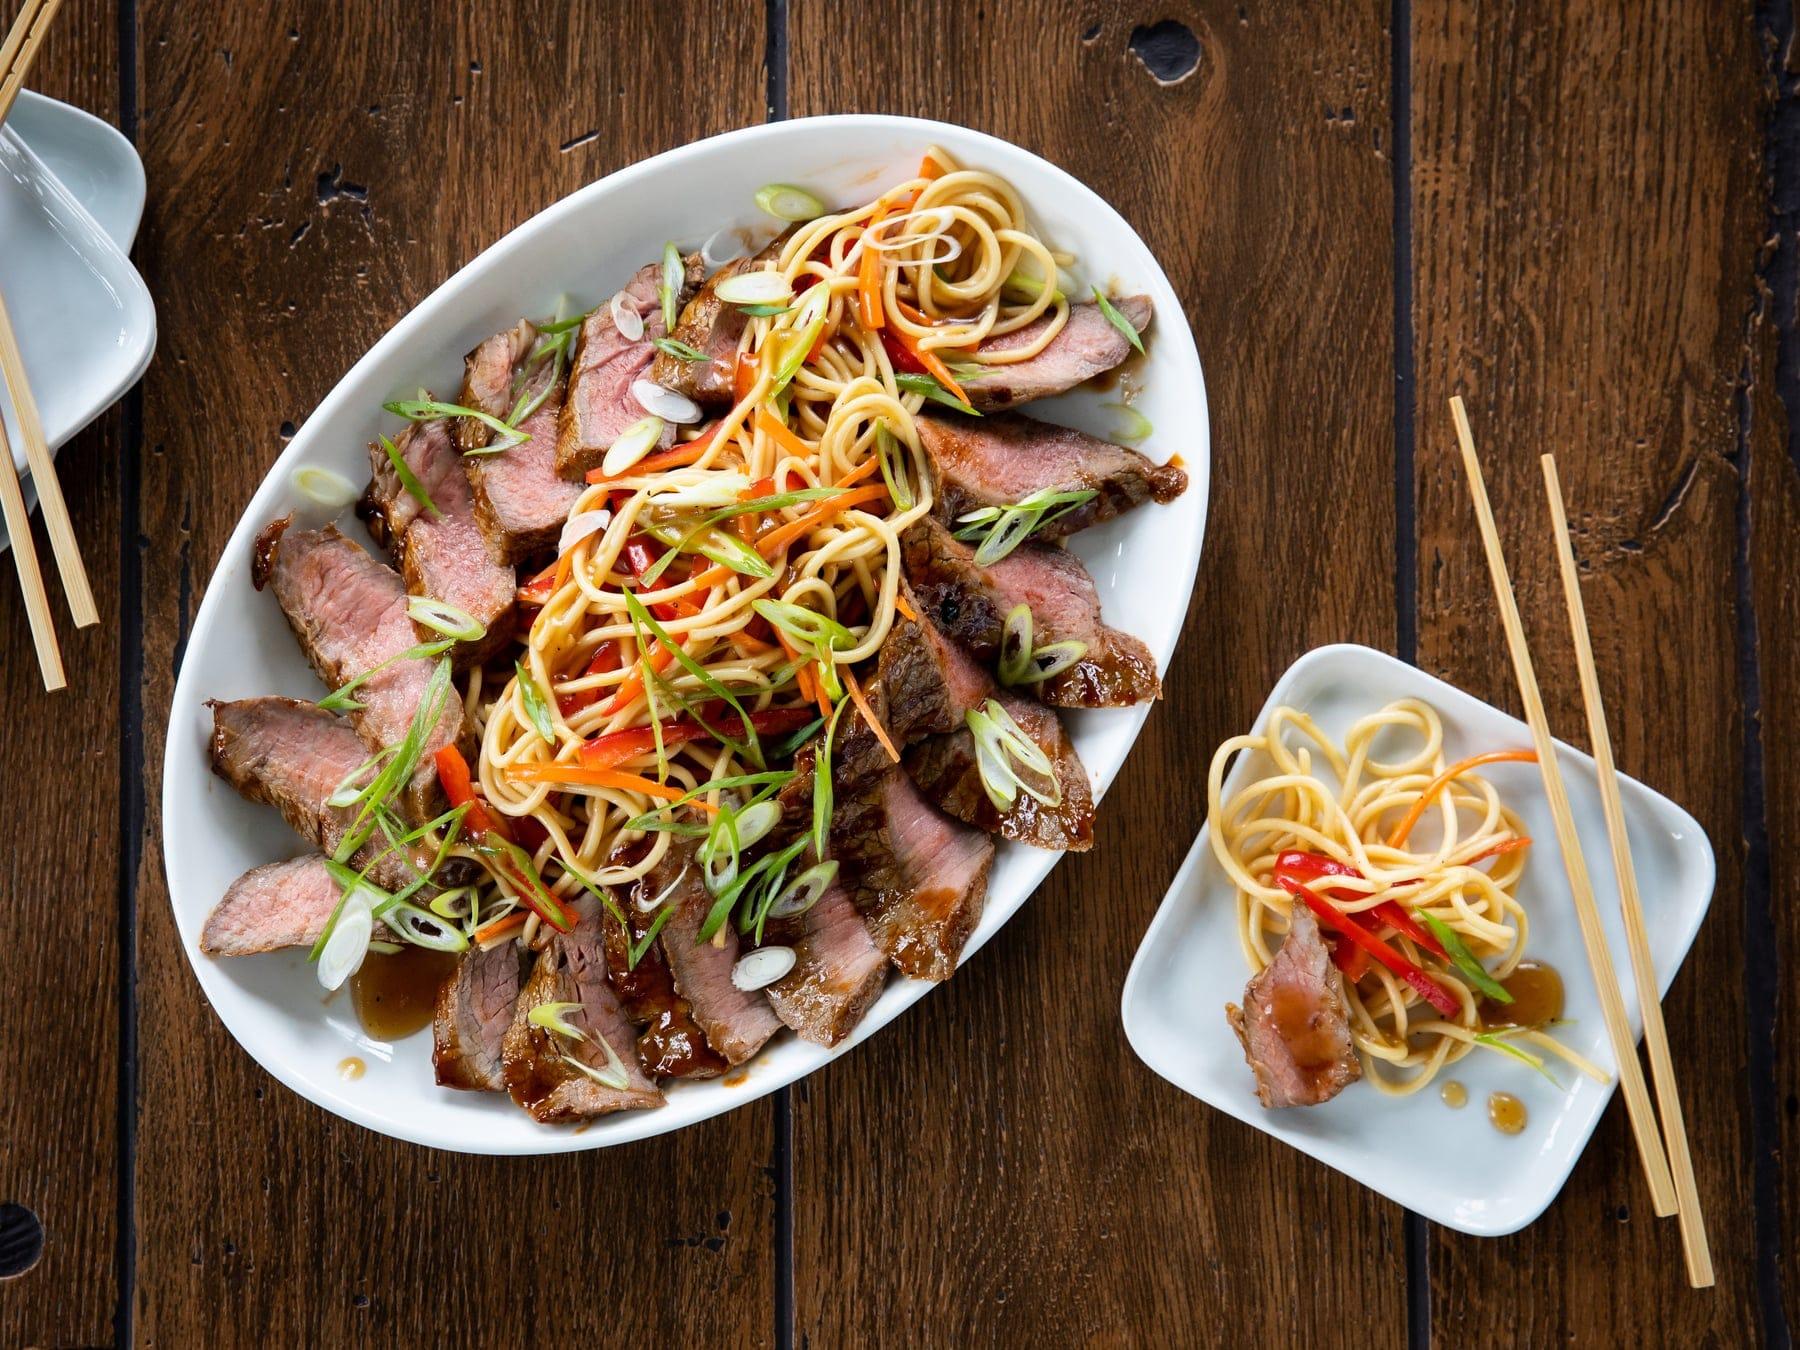 Marzetti_Flank Steak with Asian Noodles-0336